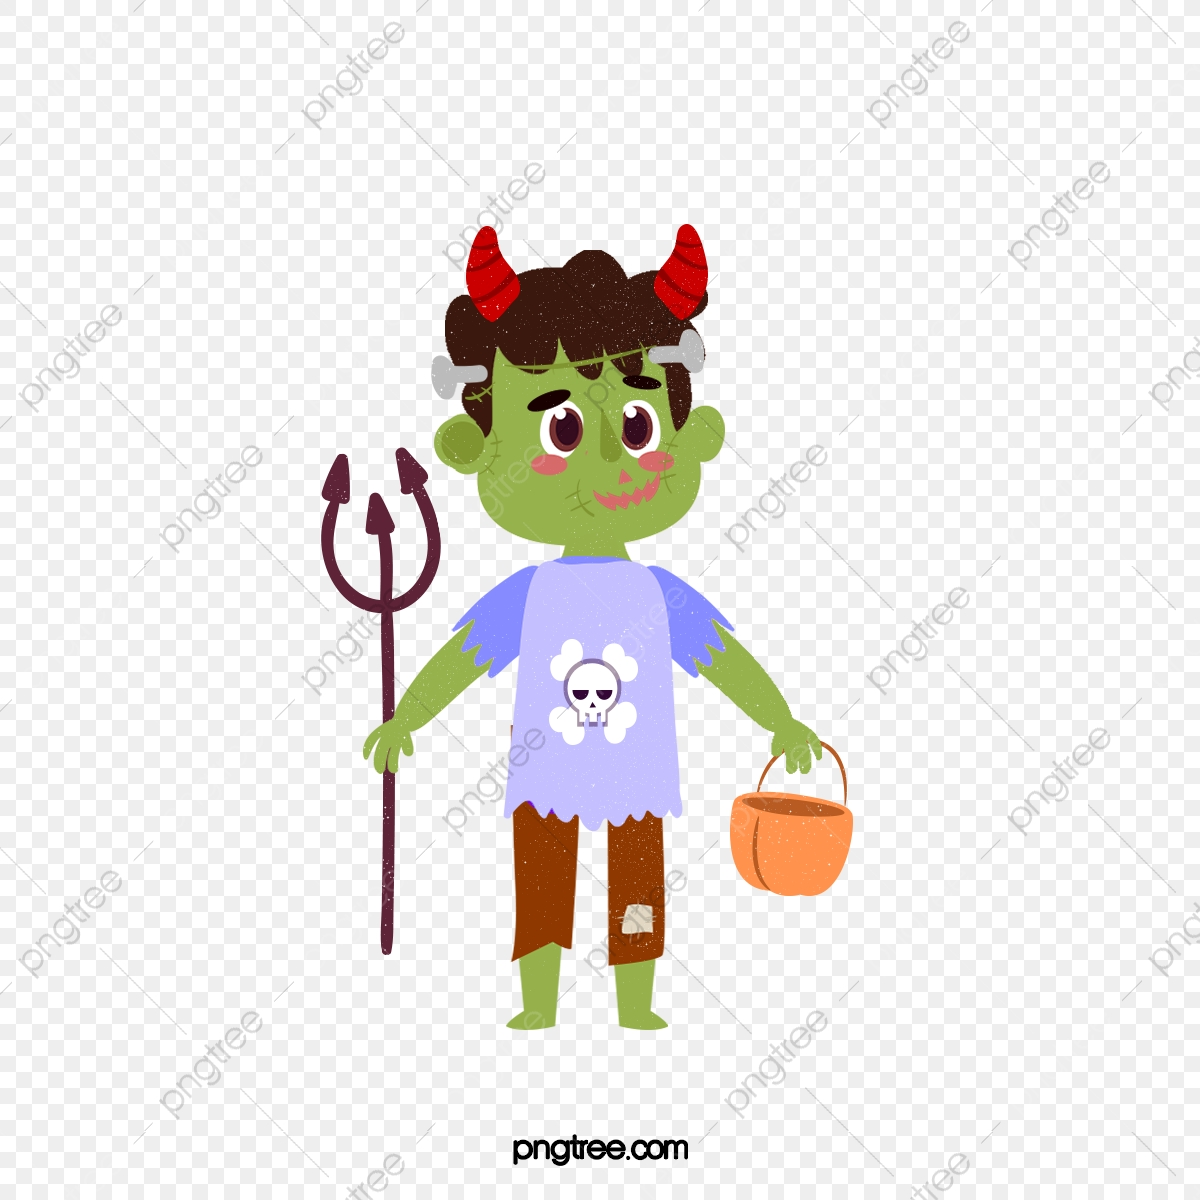 Gambar Kucing Zombie godean.web.id